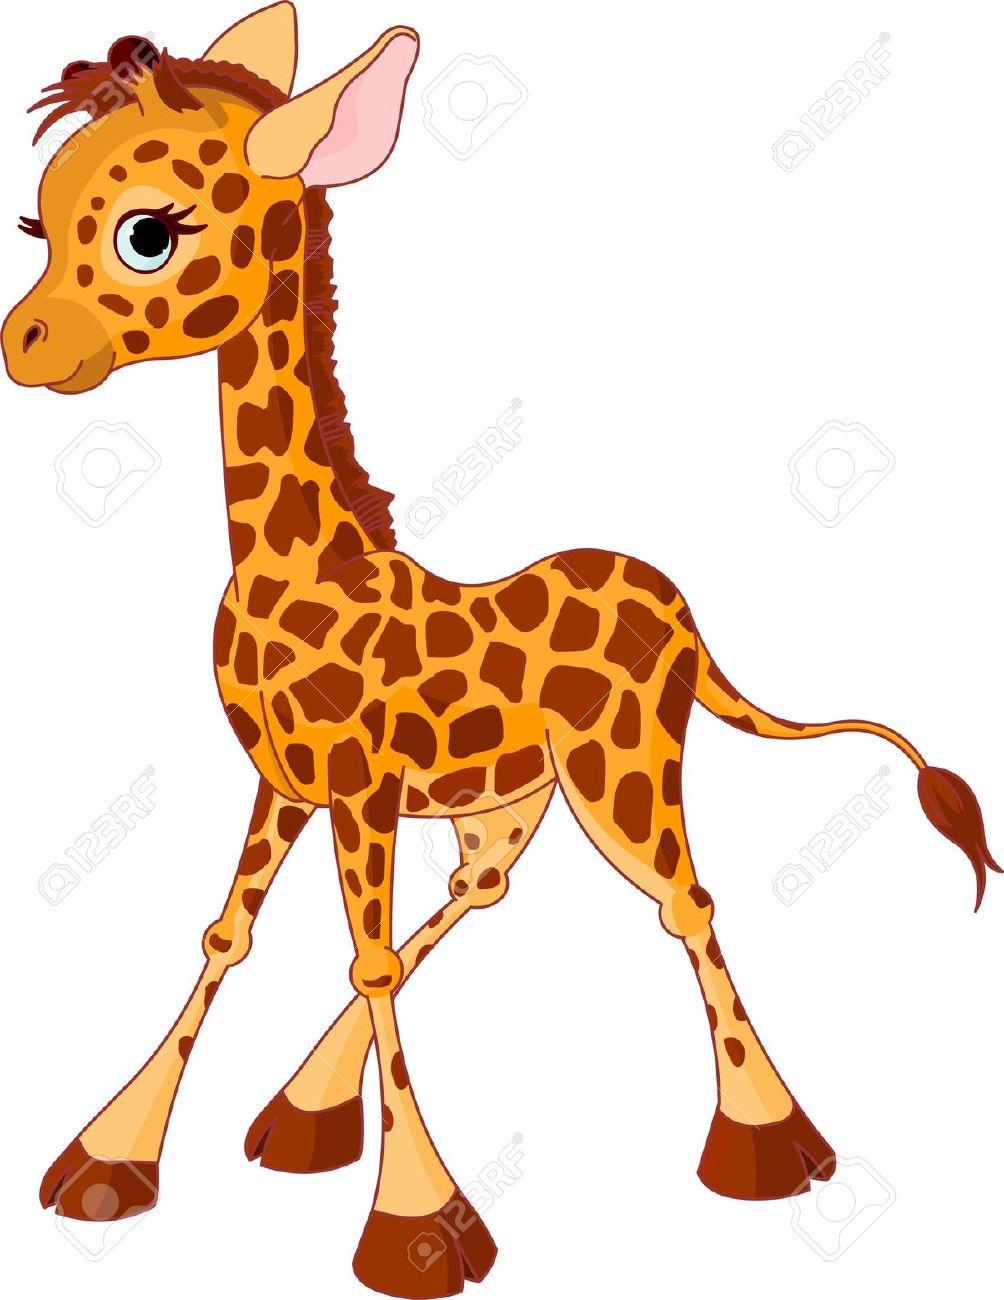 hight resolution of giraffe clipart image